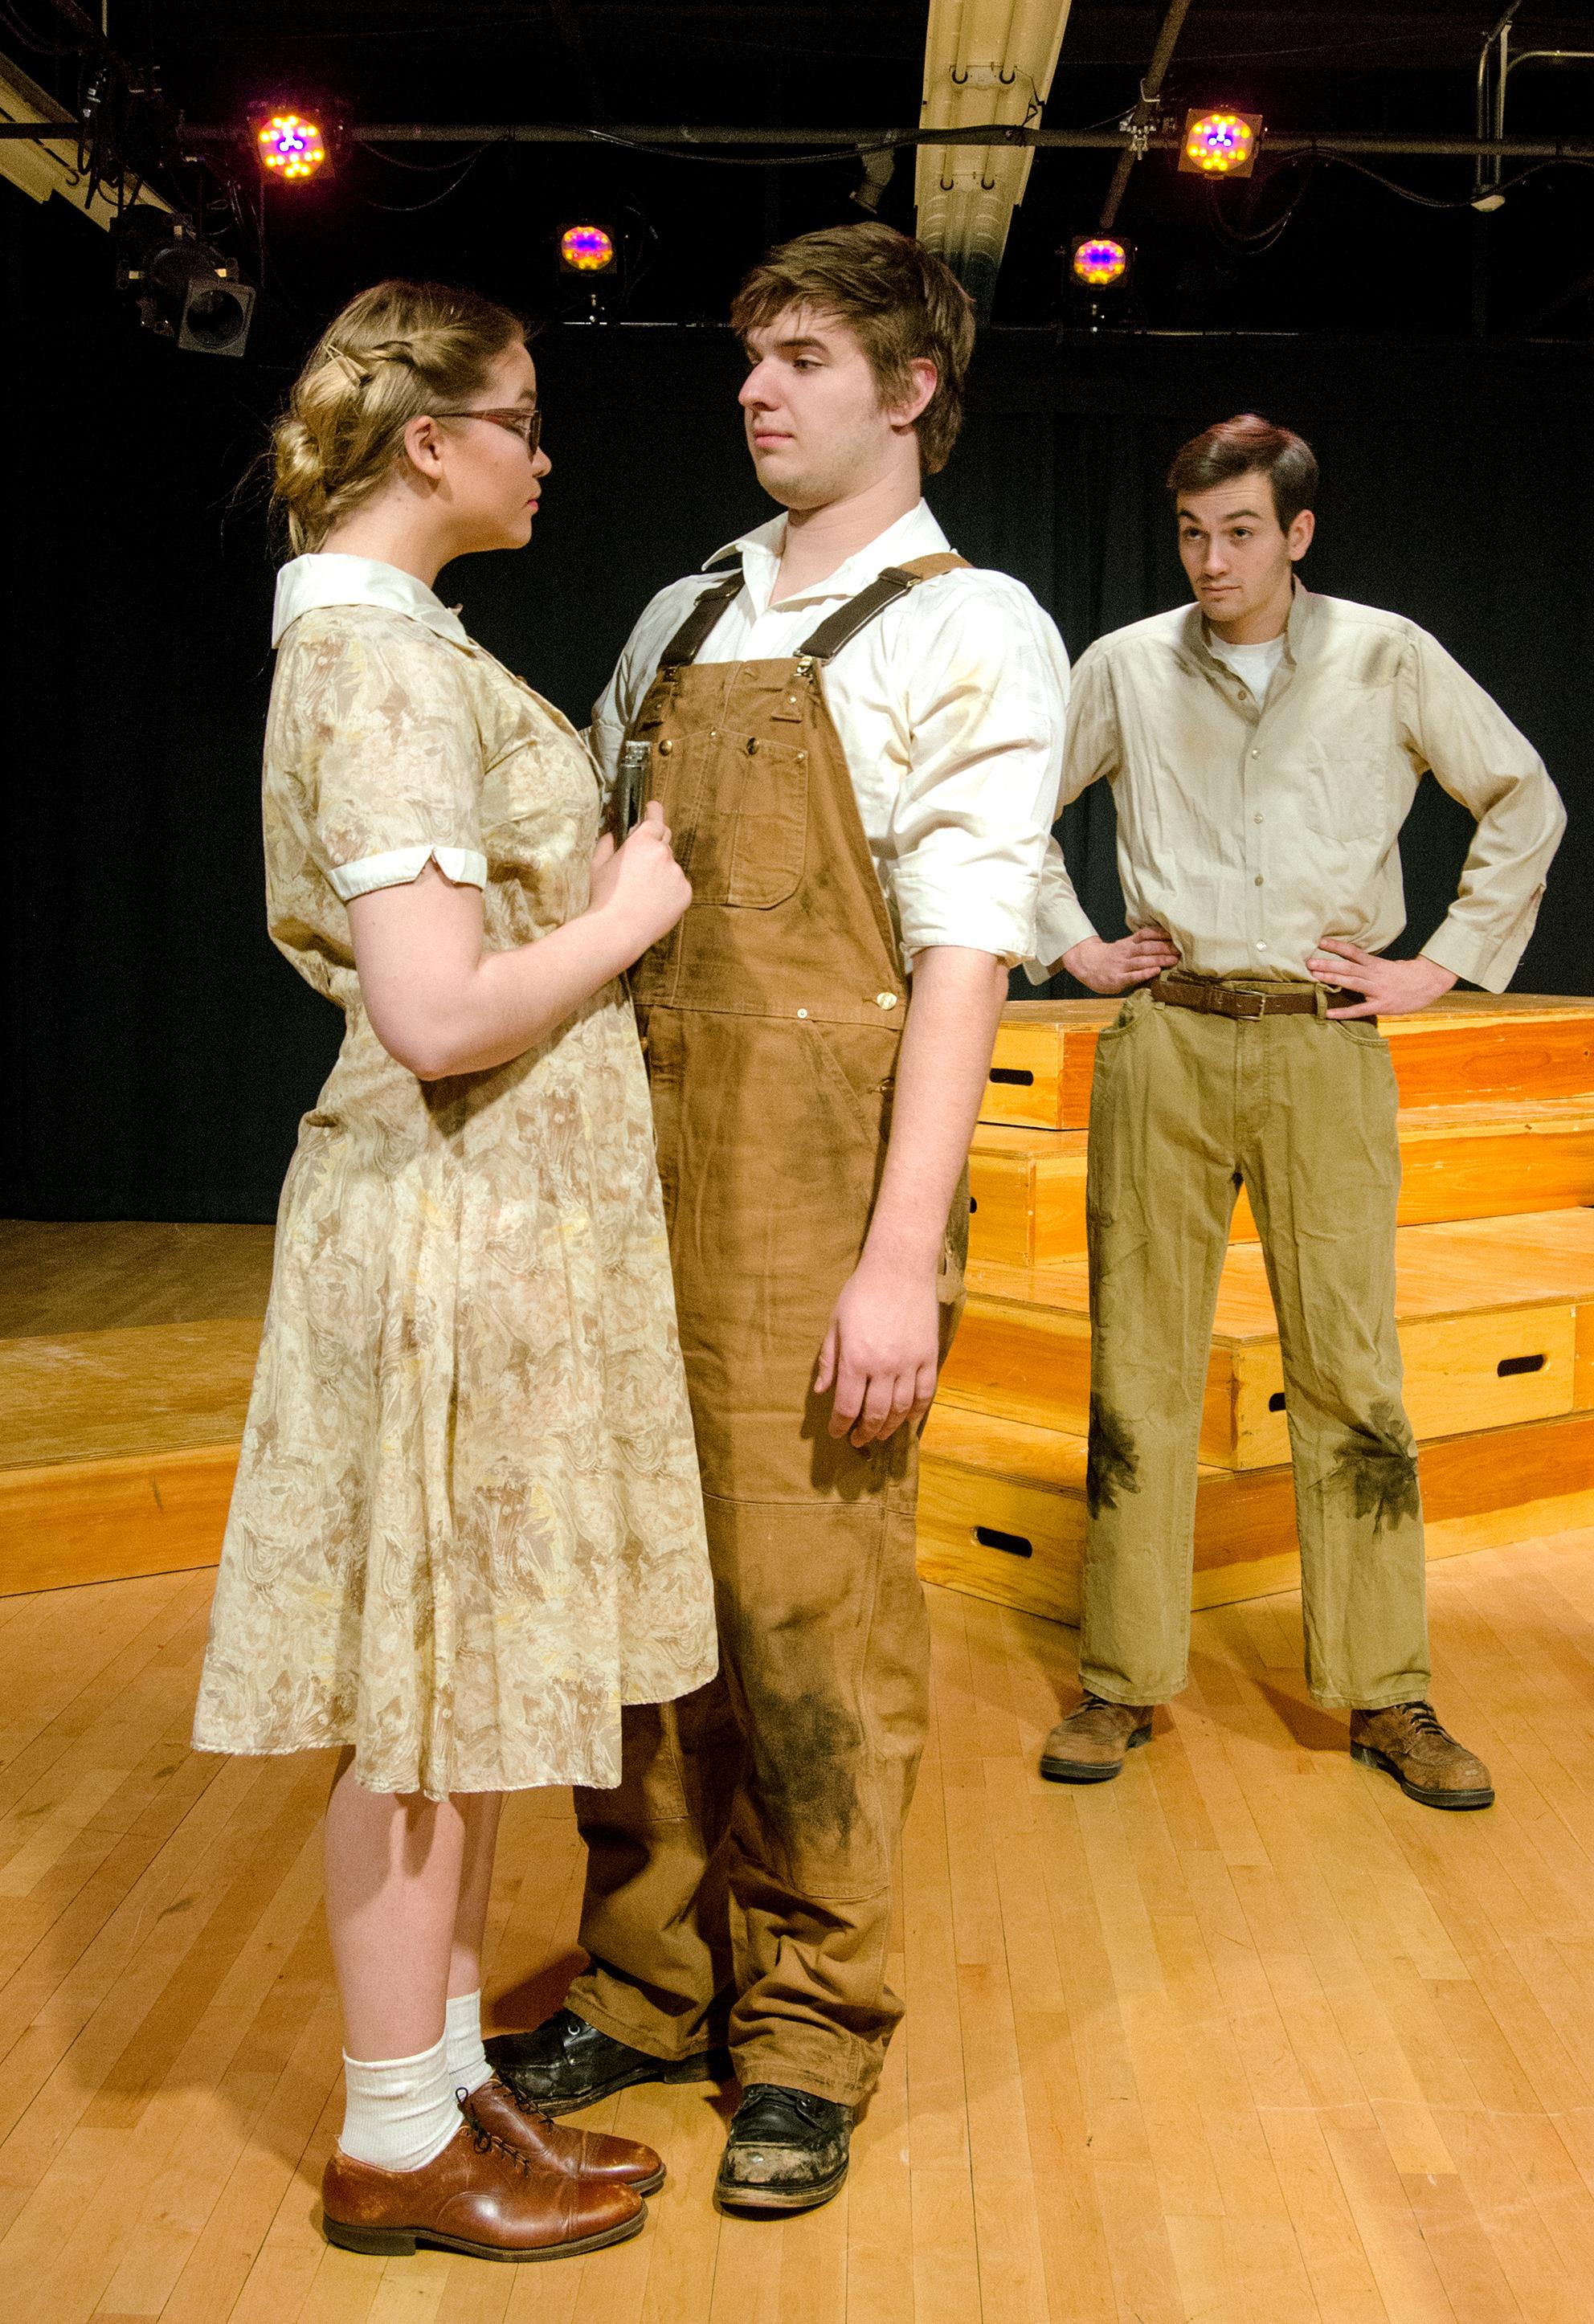 Darlene Henshaw, Dewey, and Melvin